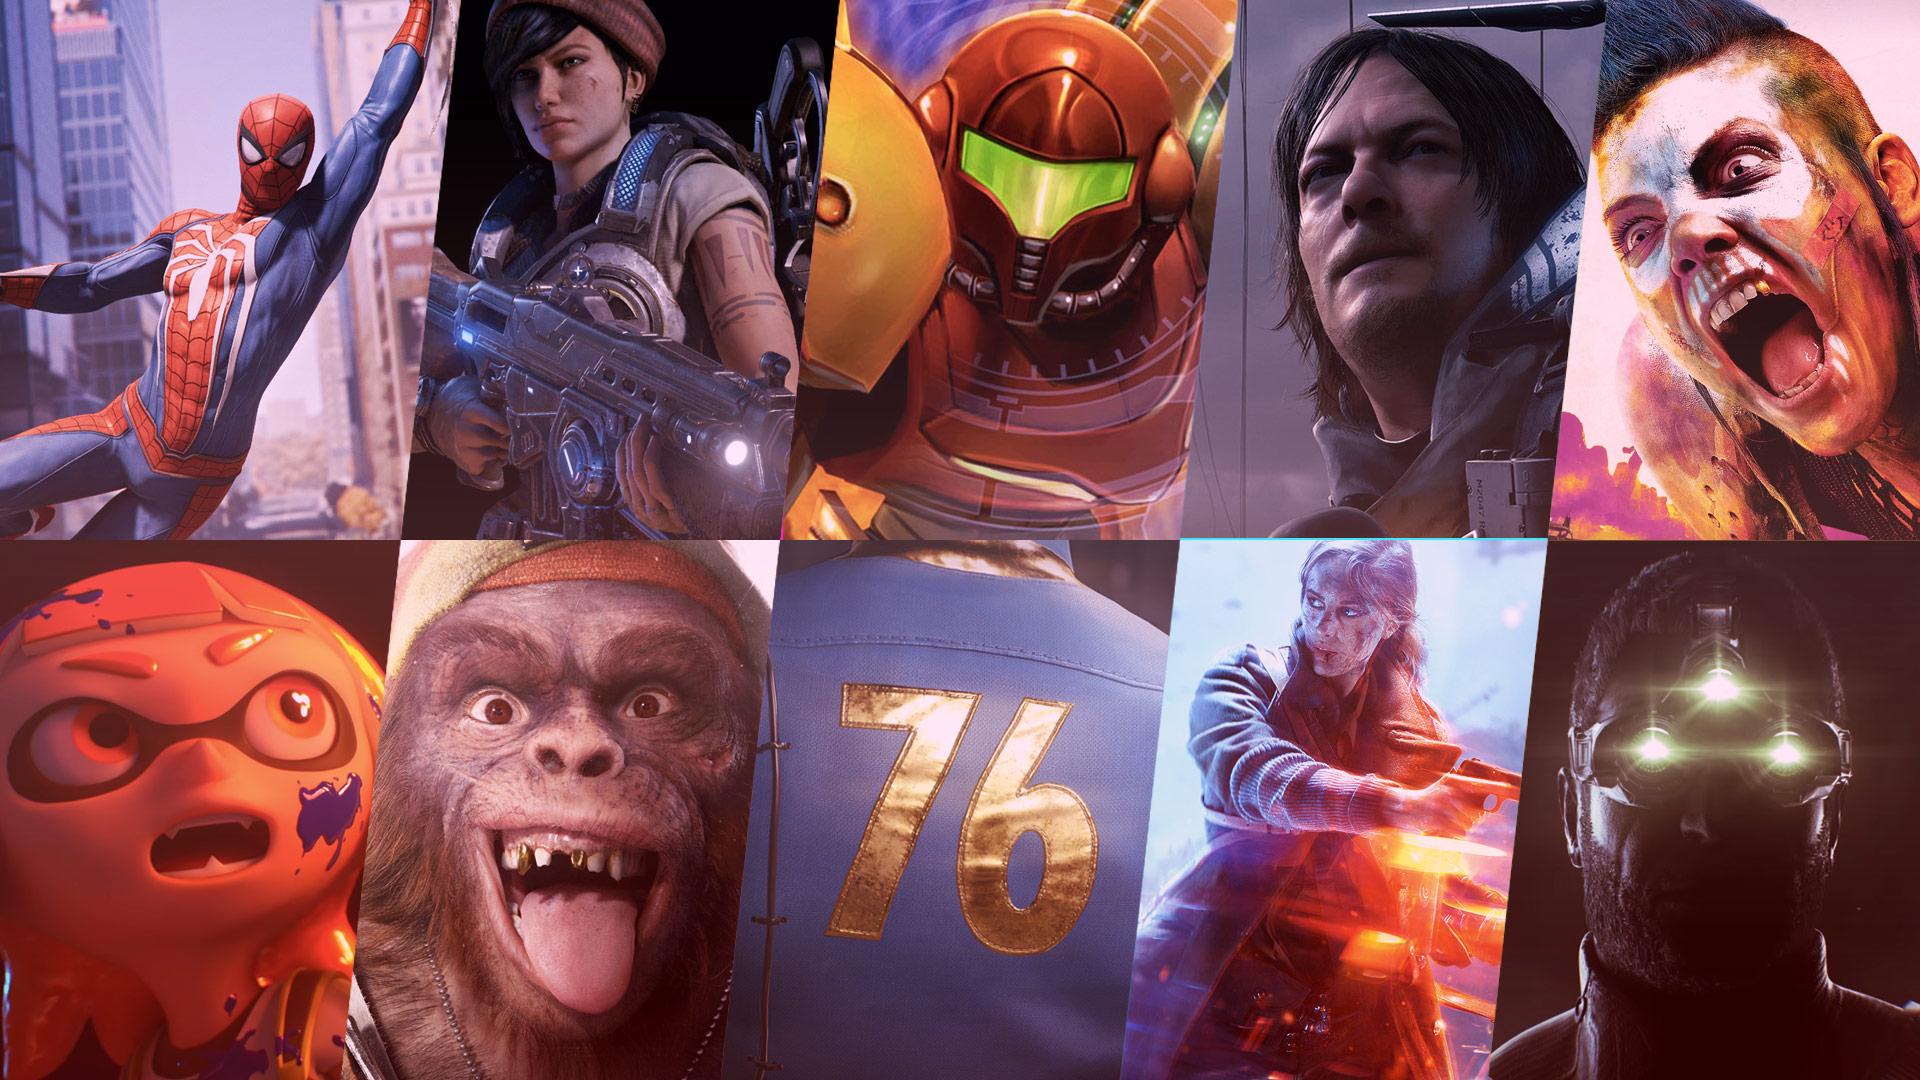 The biggest rumors of E3 2018